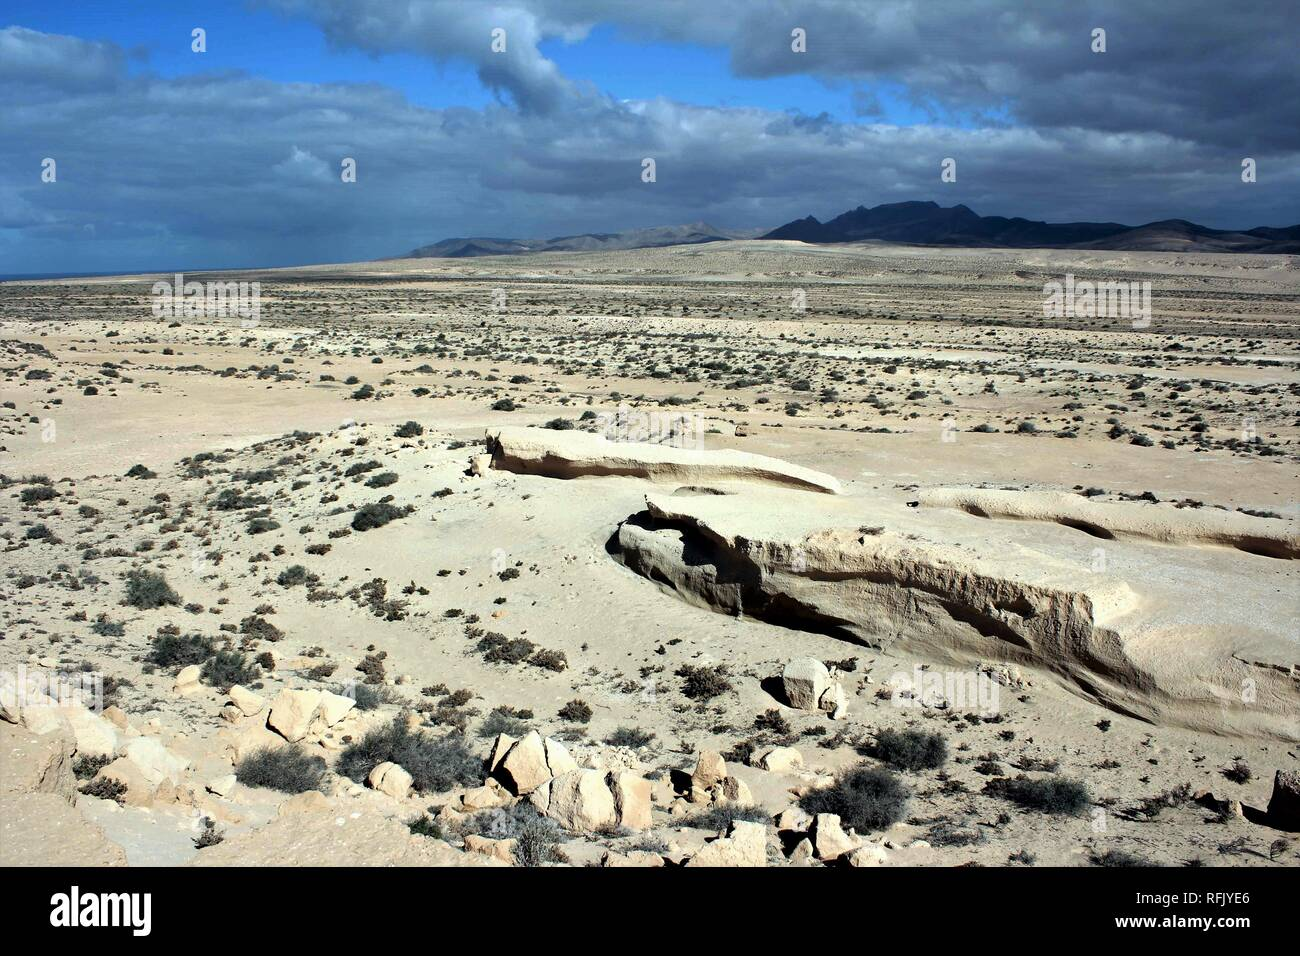 The walking sand dunes of the Jandia peninsula near Costa Calma on the island of Fuerteventura, Spain. Stock Photo